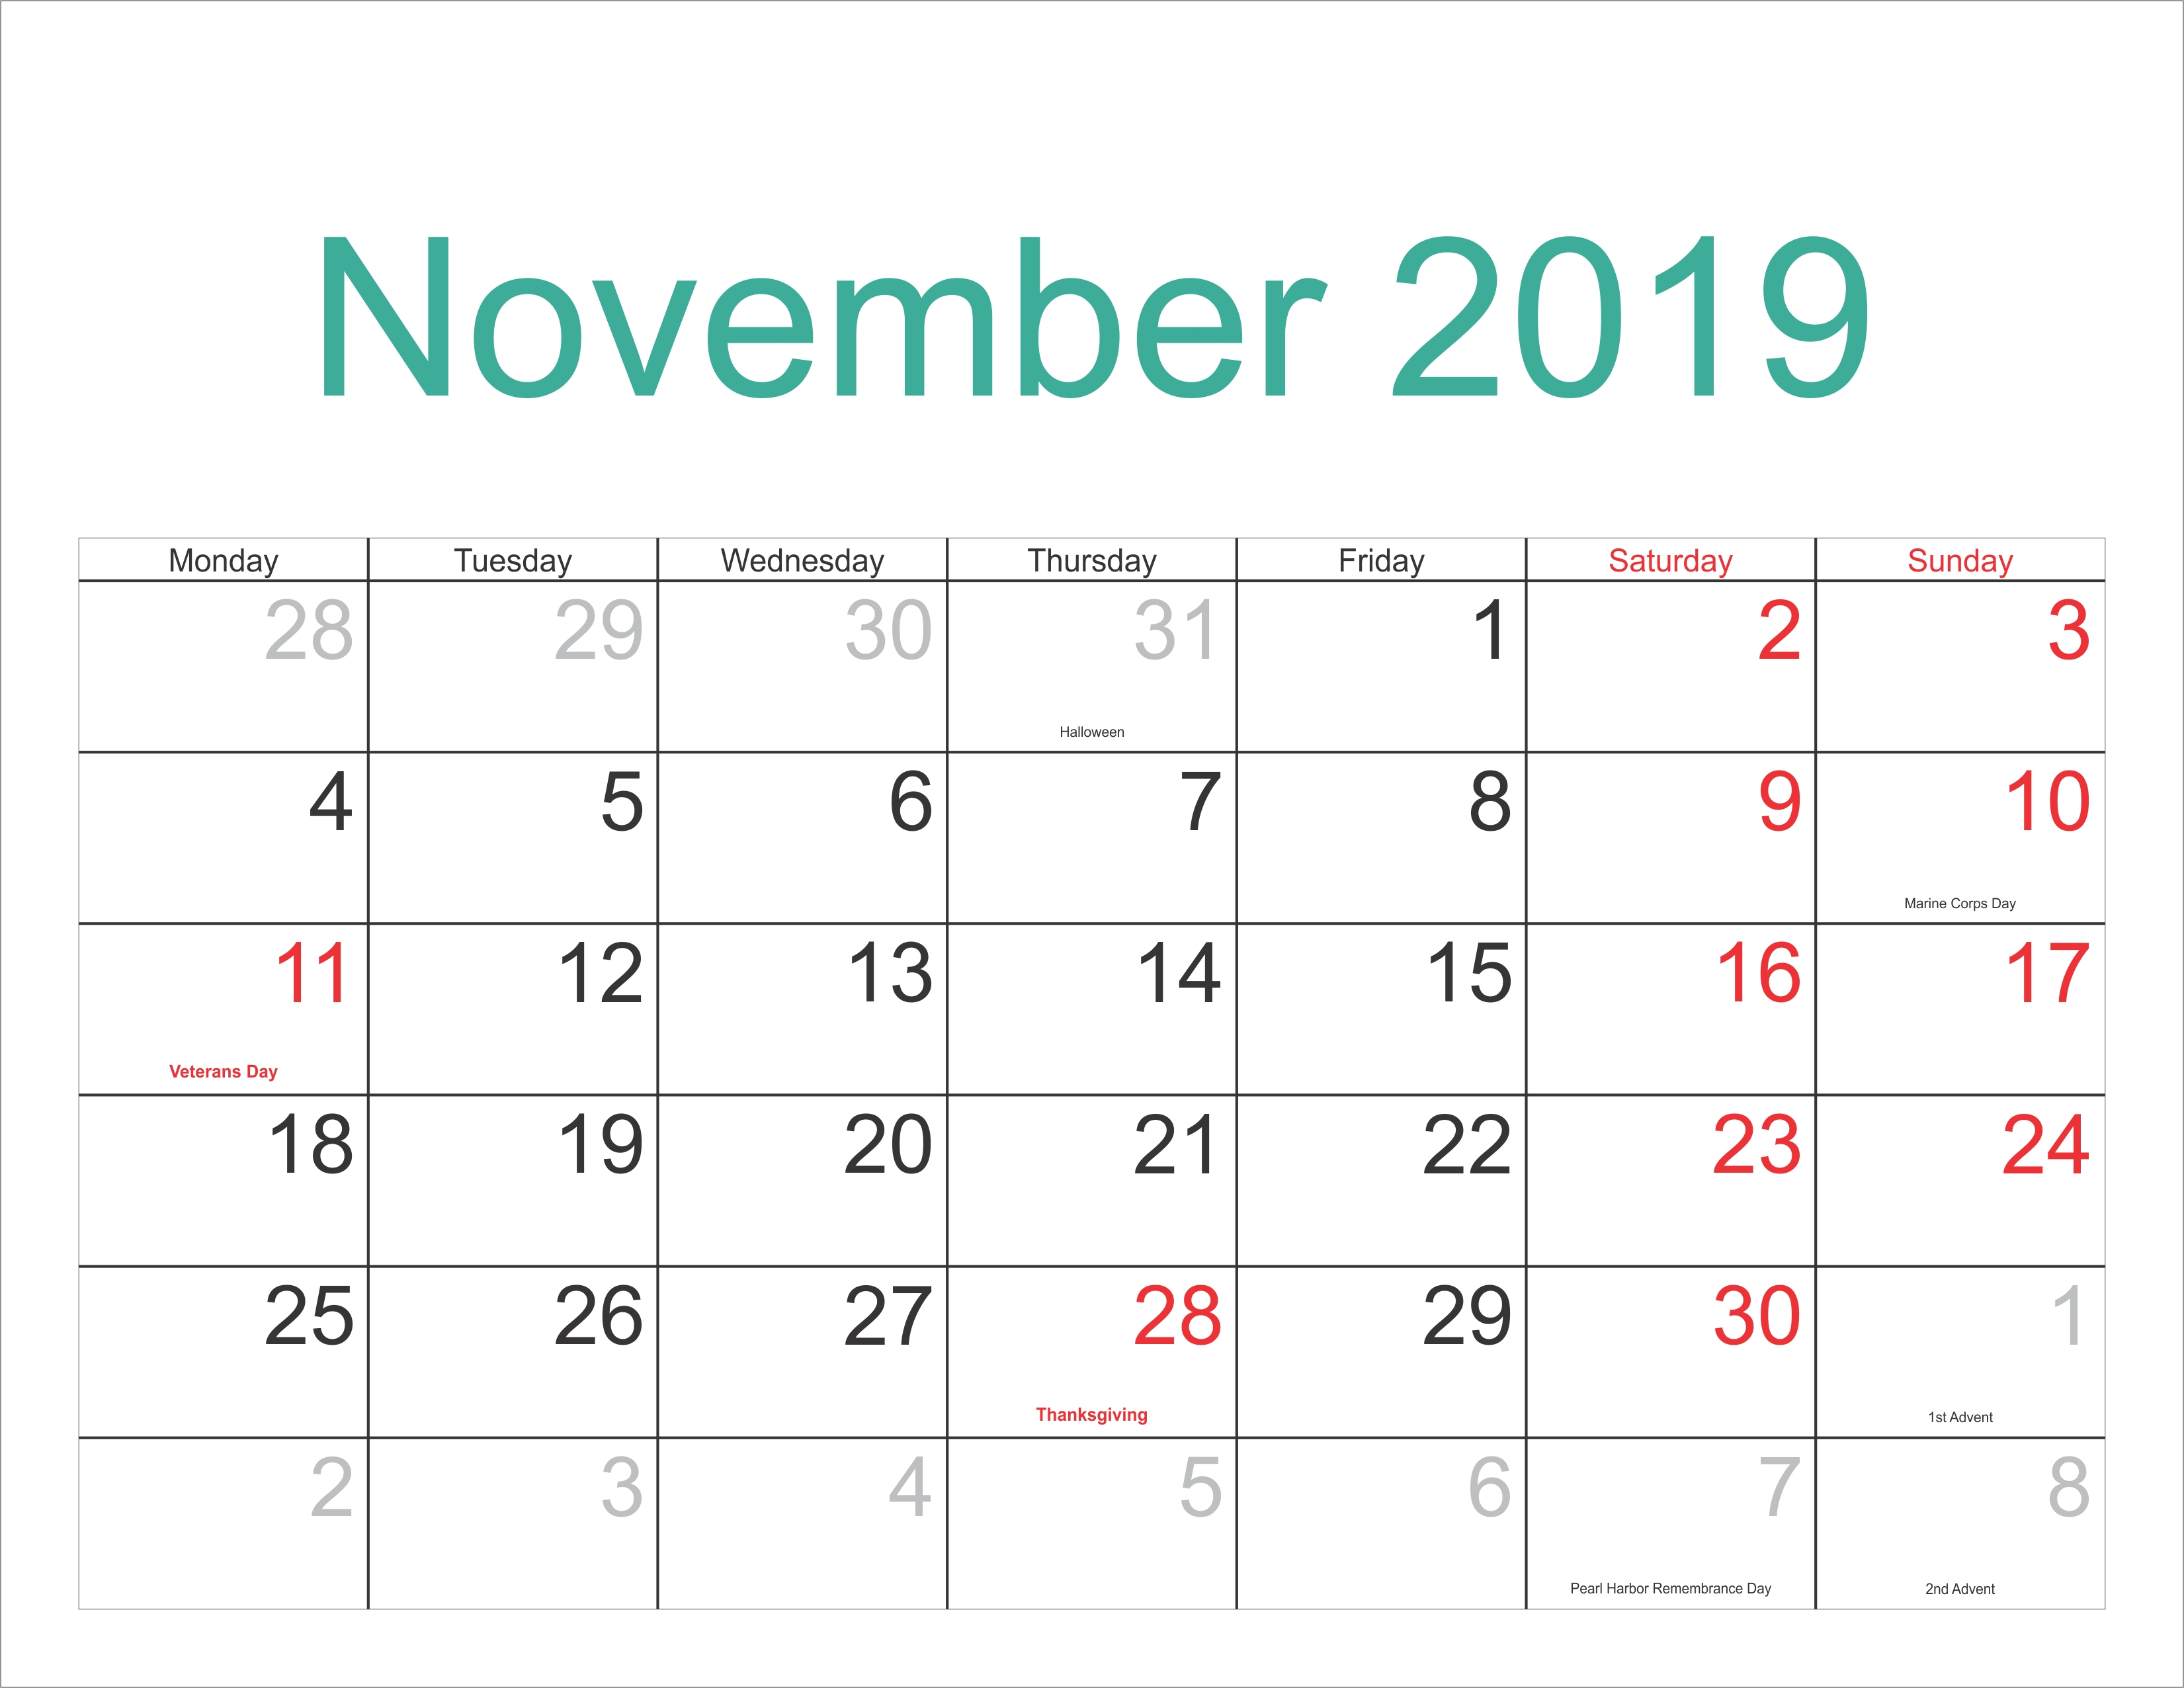 November 2019 Excel Calendar - Free November 2018 Calendar Calendar 2019 For Excel